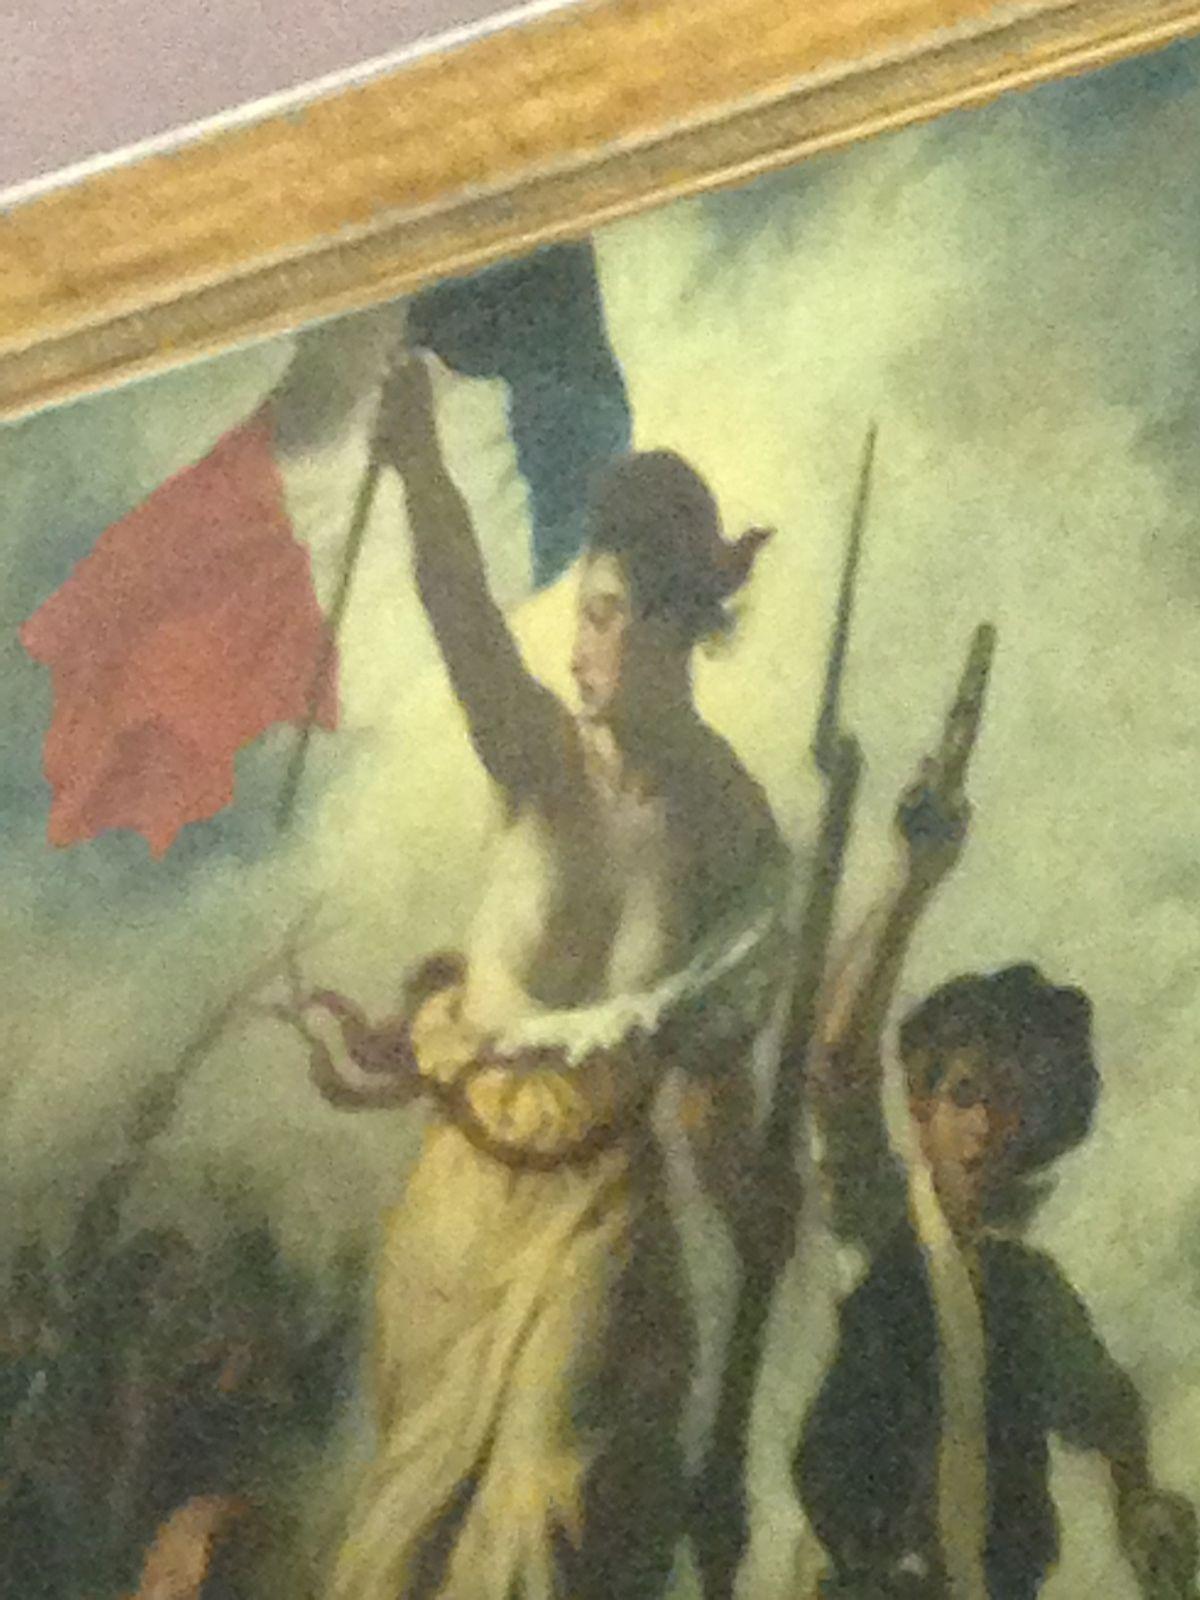 The 1830 Revolution